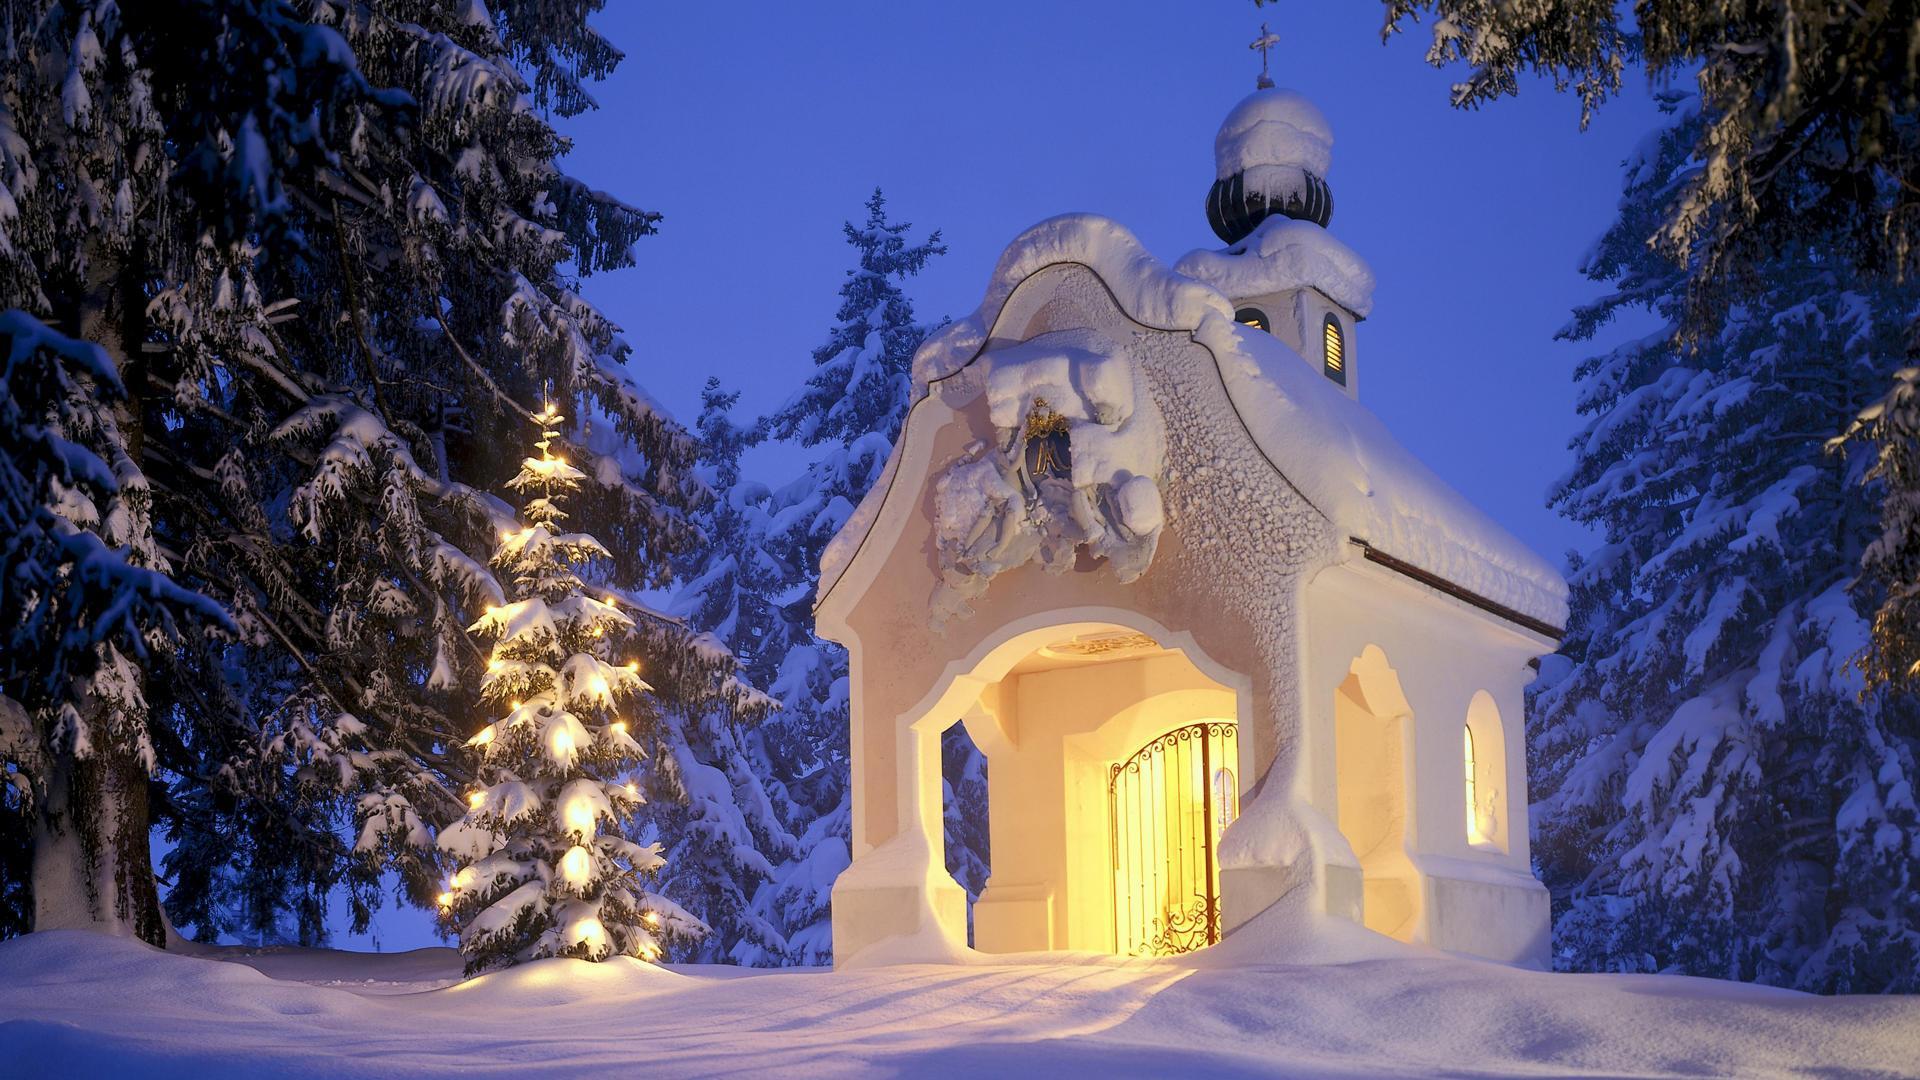 Зима снег елка часовня рождество